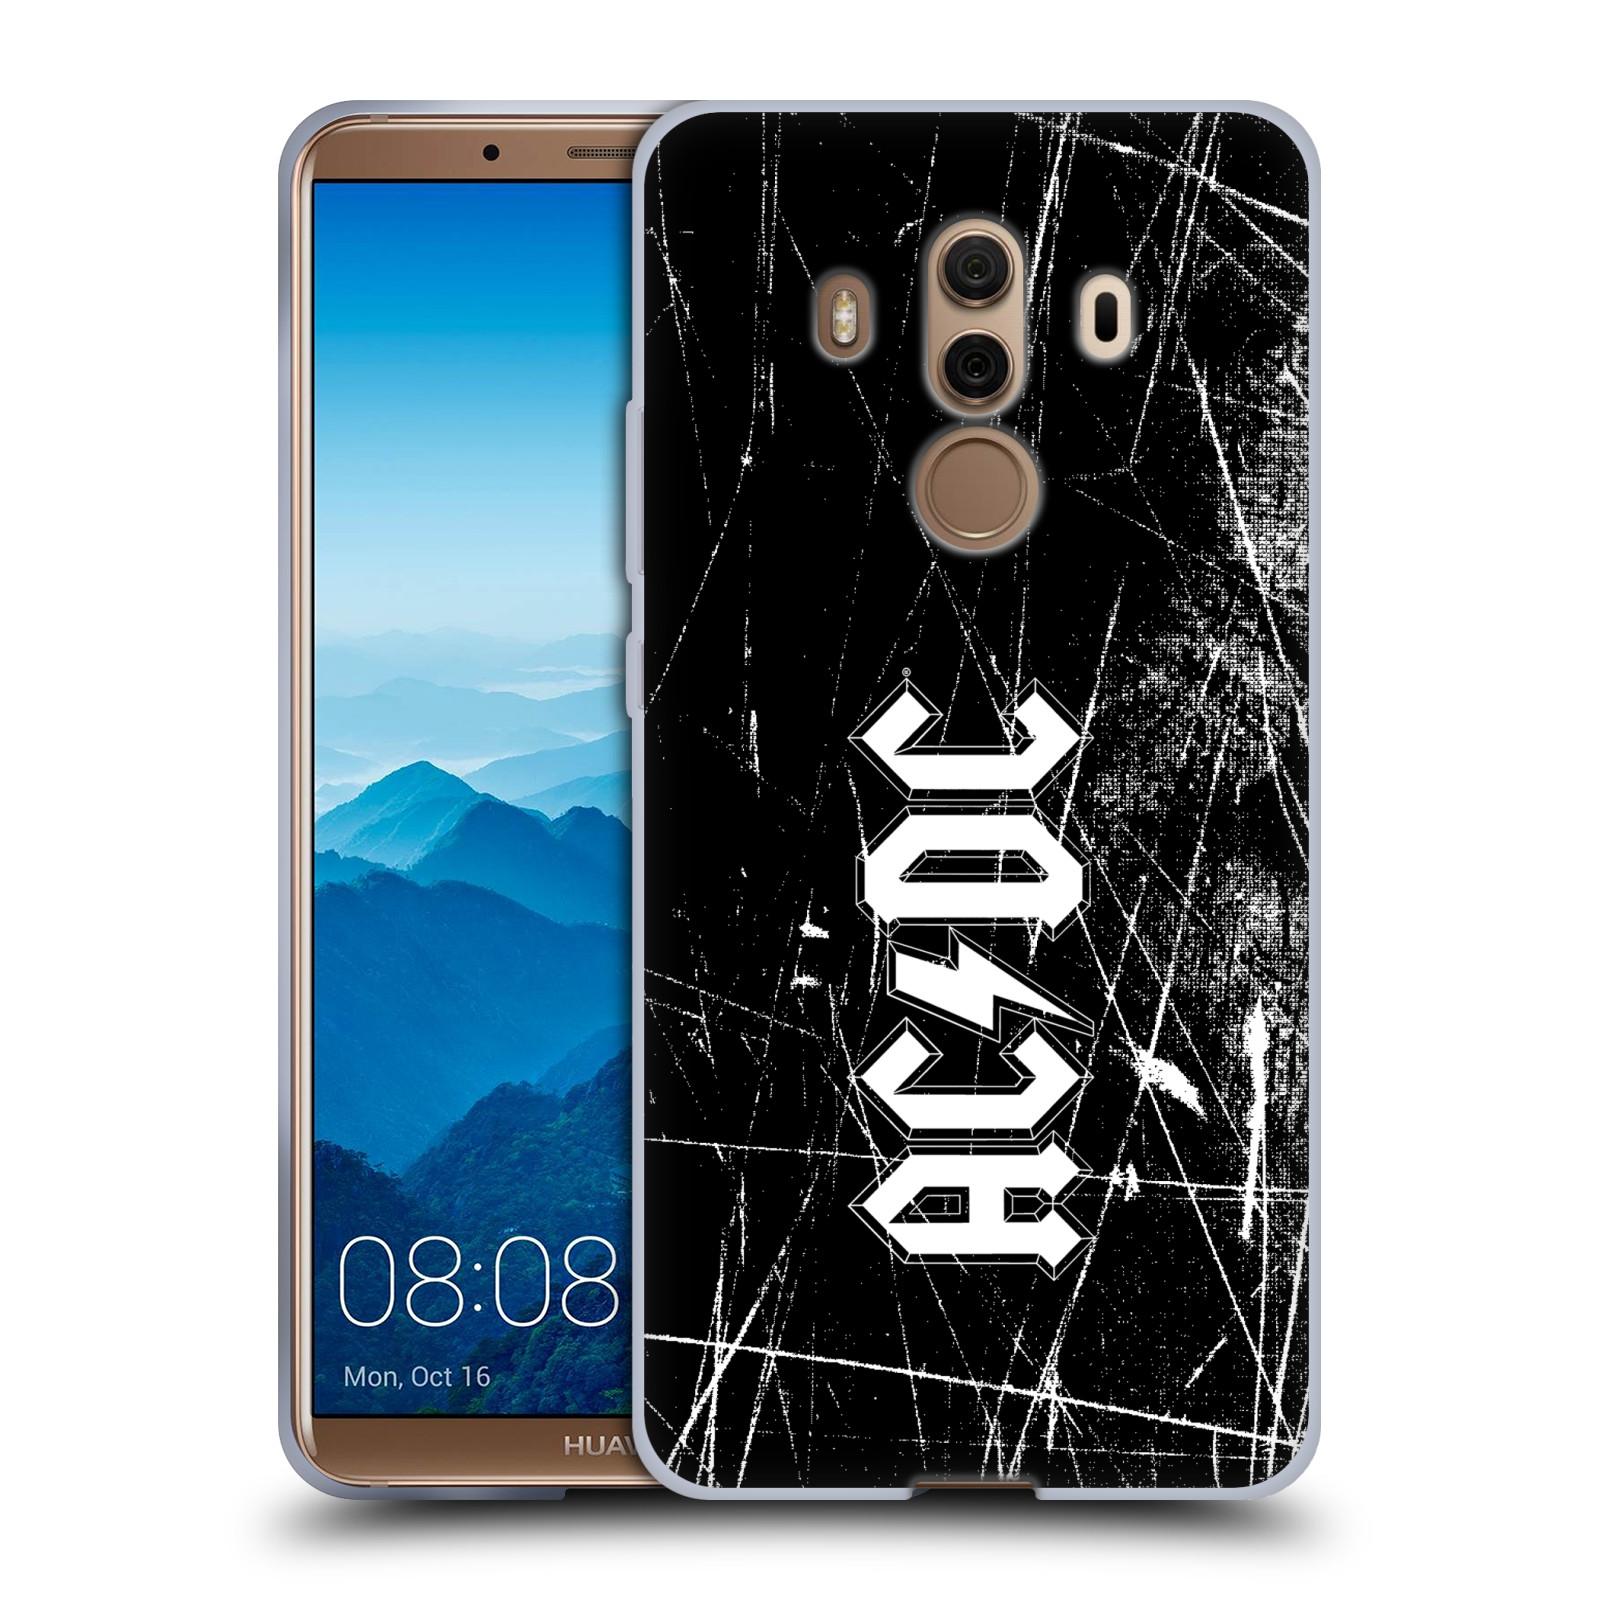 Silikonové pouzdro na mobil Huawei Mate 10 Pro - Head Case - AC/DC Černobílé logo